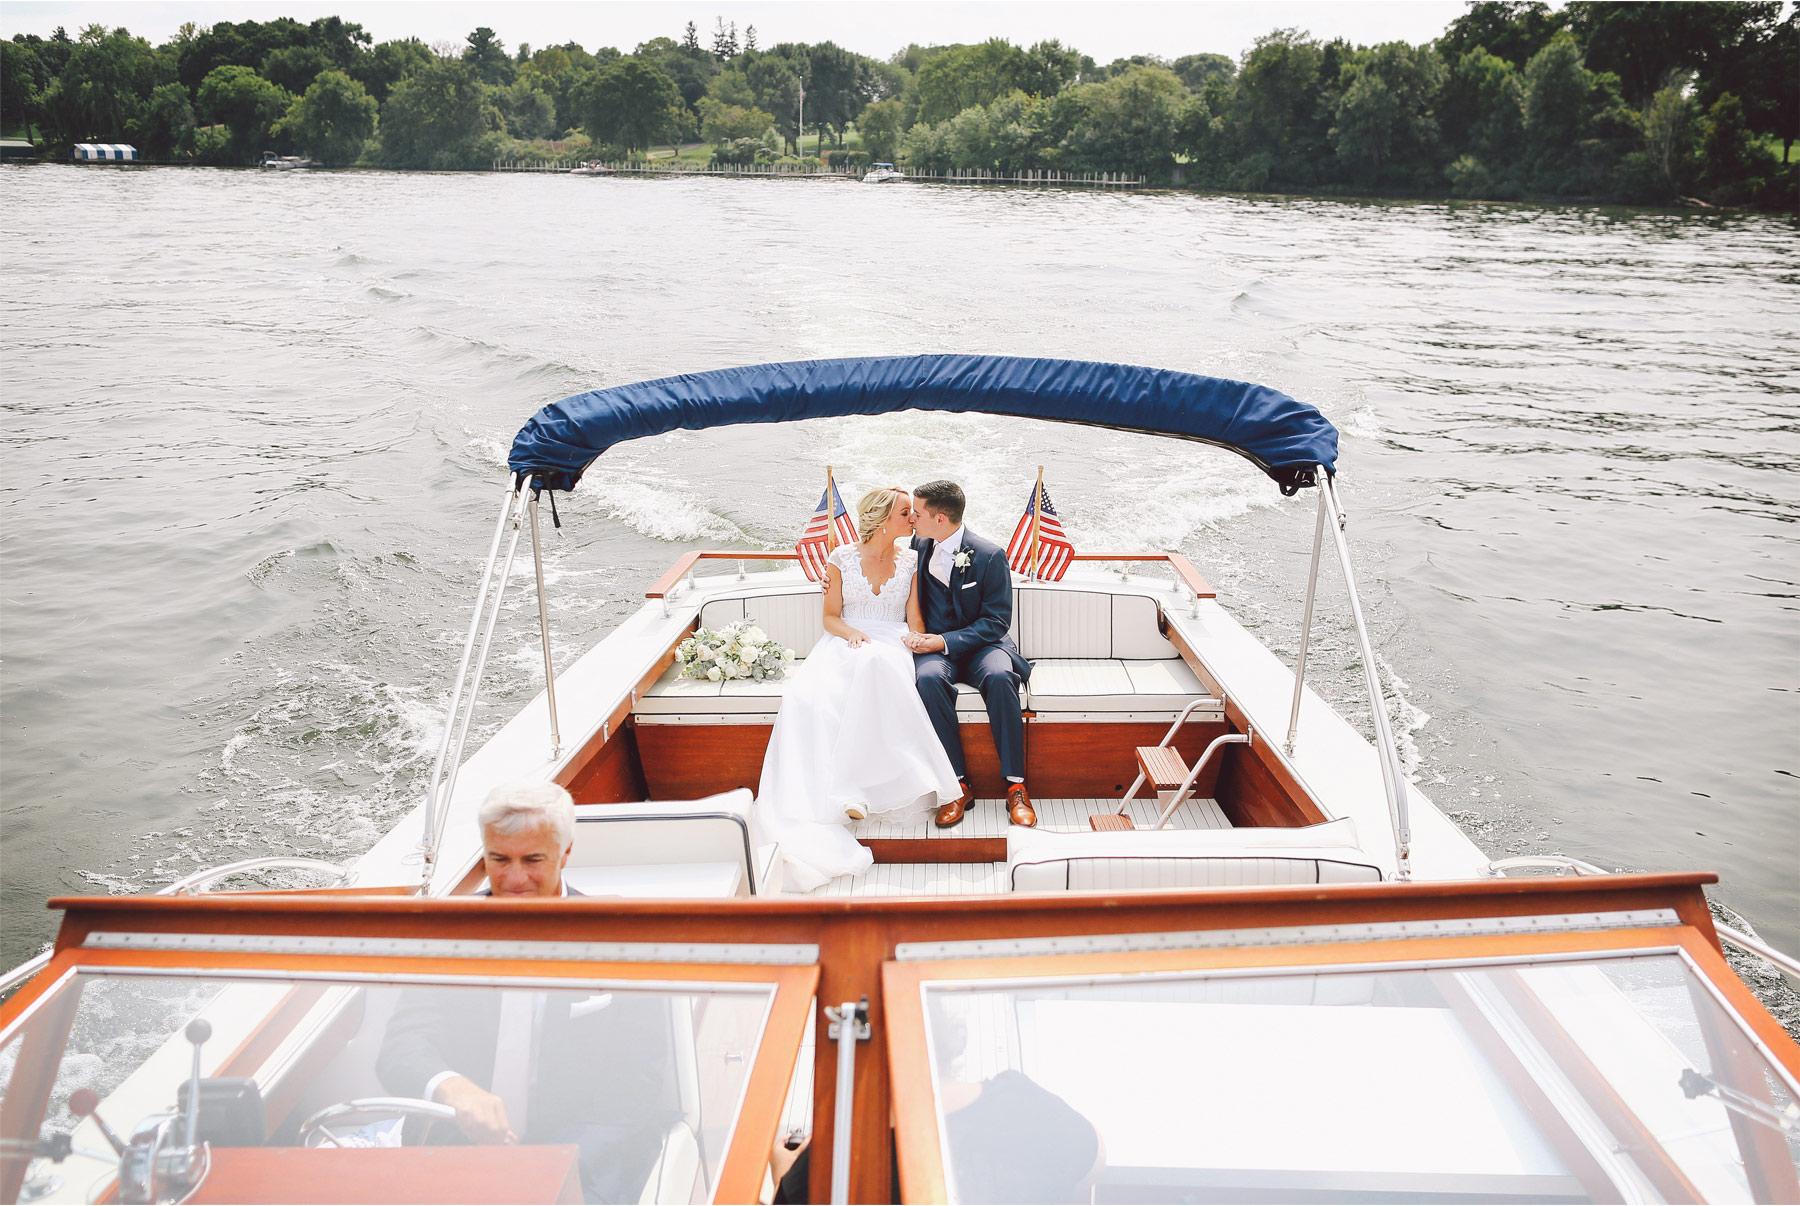 06-Minnetonka-Minnesota-Wedding-Photography-by-Vick-Photography-Boat-Lake-Minnetonka-First-Meeting-Jennifer-and-Adam.jpg